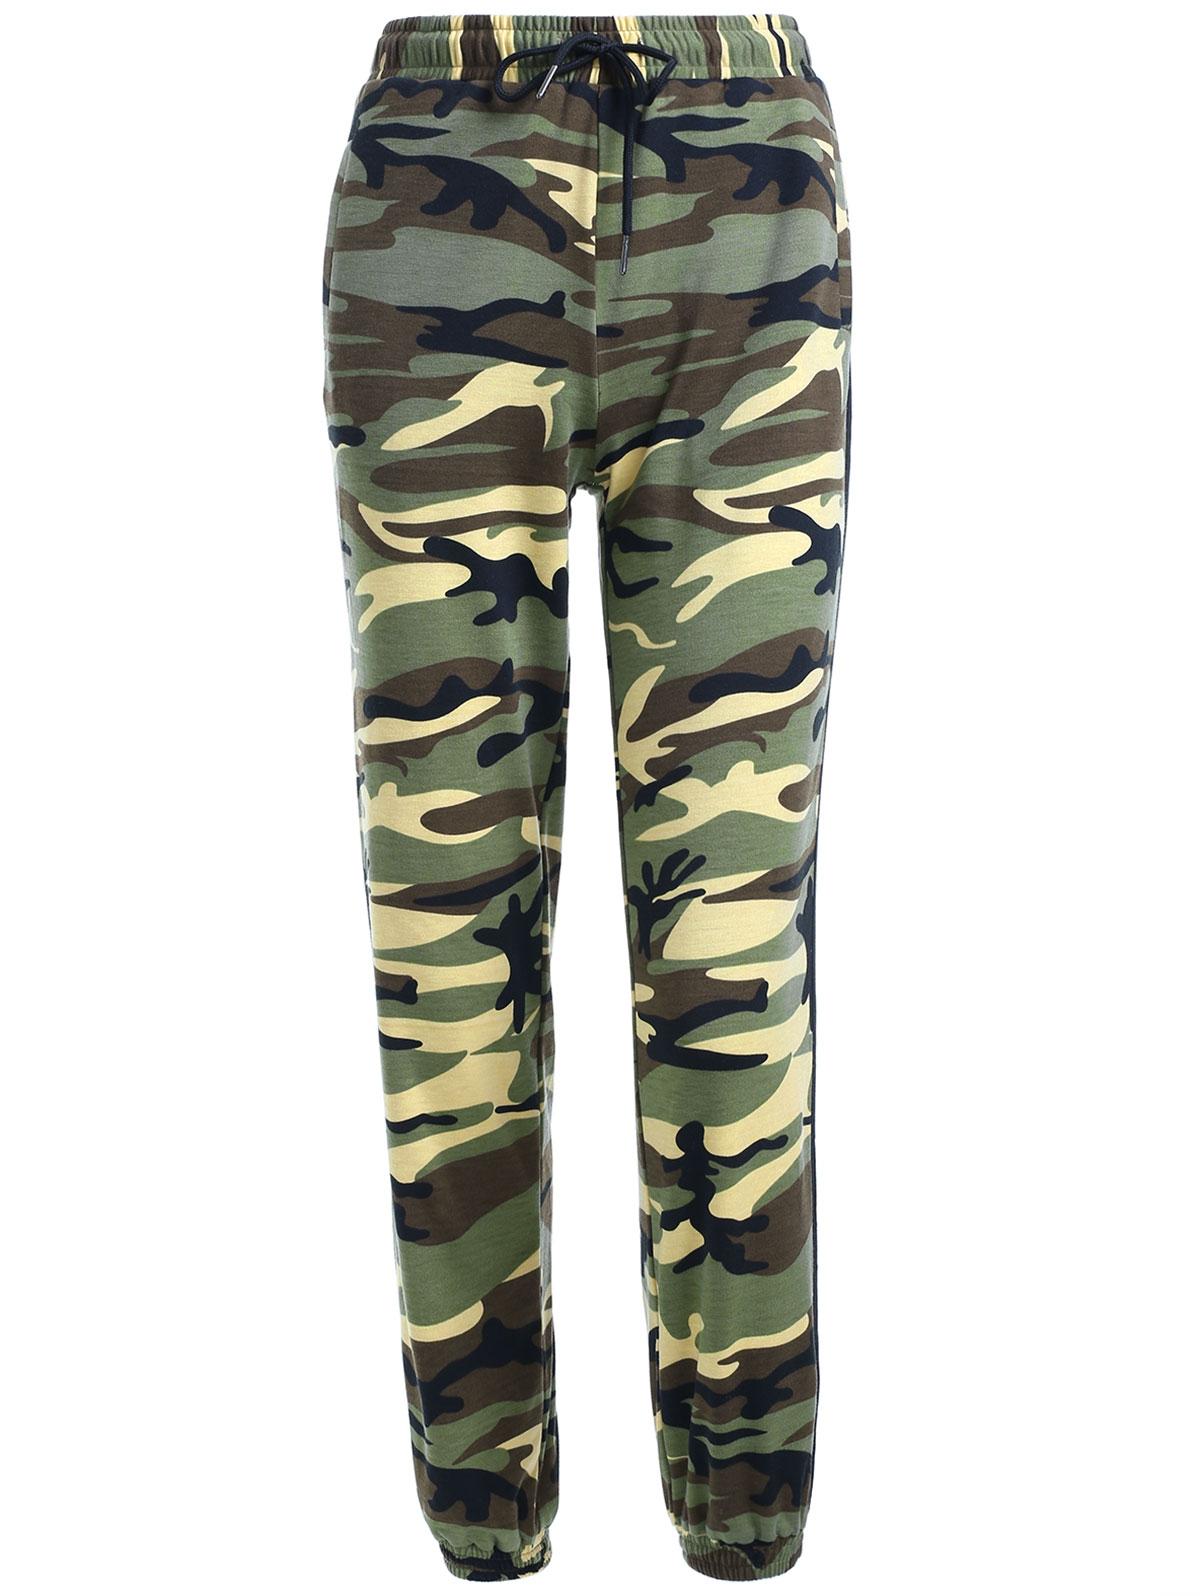 Newest Coming Fashionable Lace-Up Ninth Elastic Waist Slim Pencil Pants Narrow Feet Camo Print Women's Pants(China (Mainland))